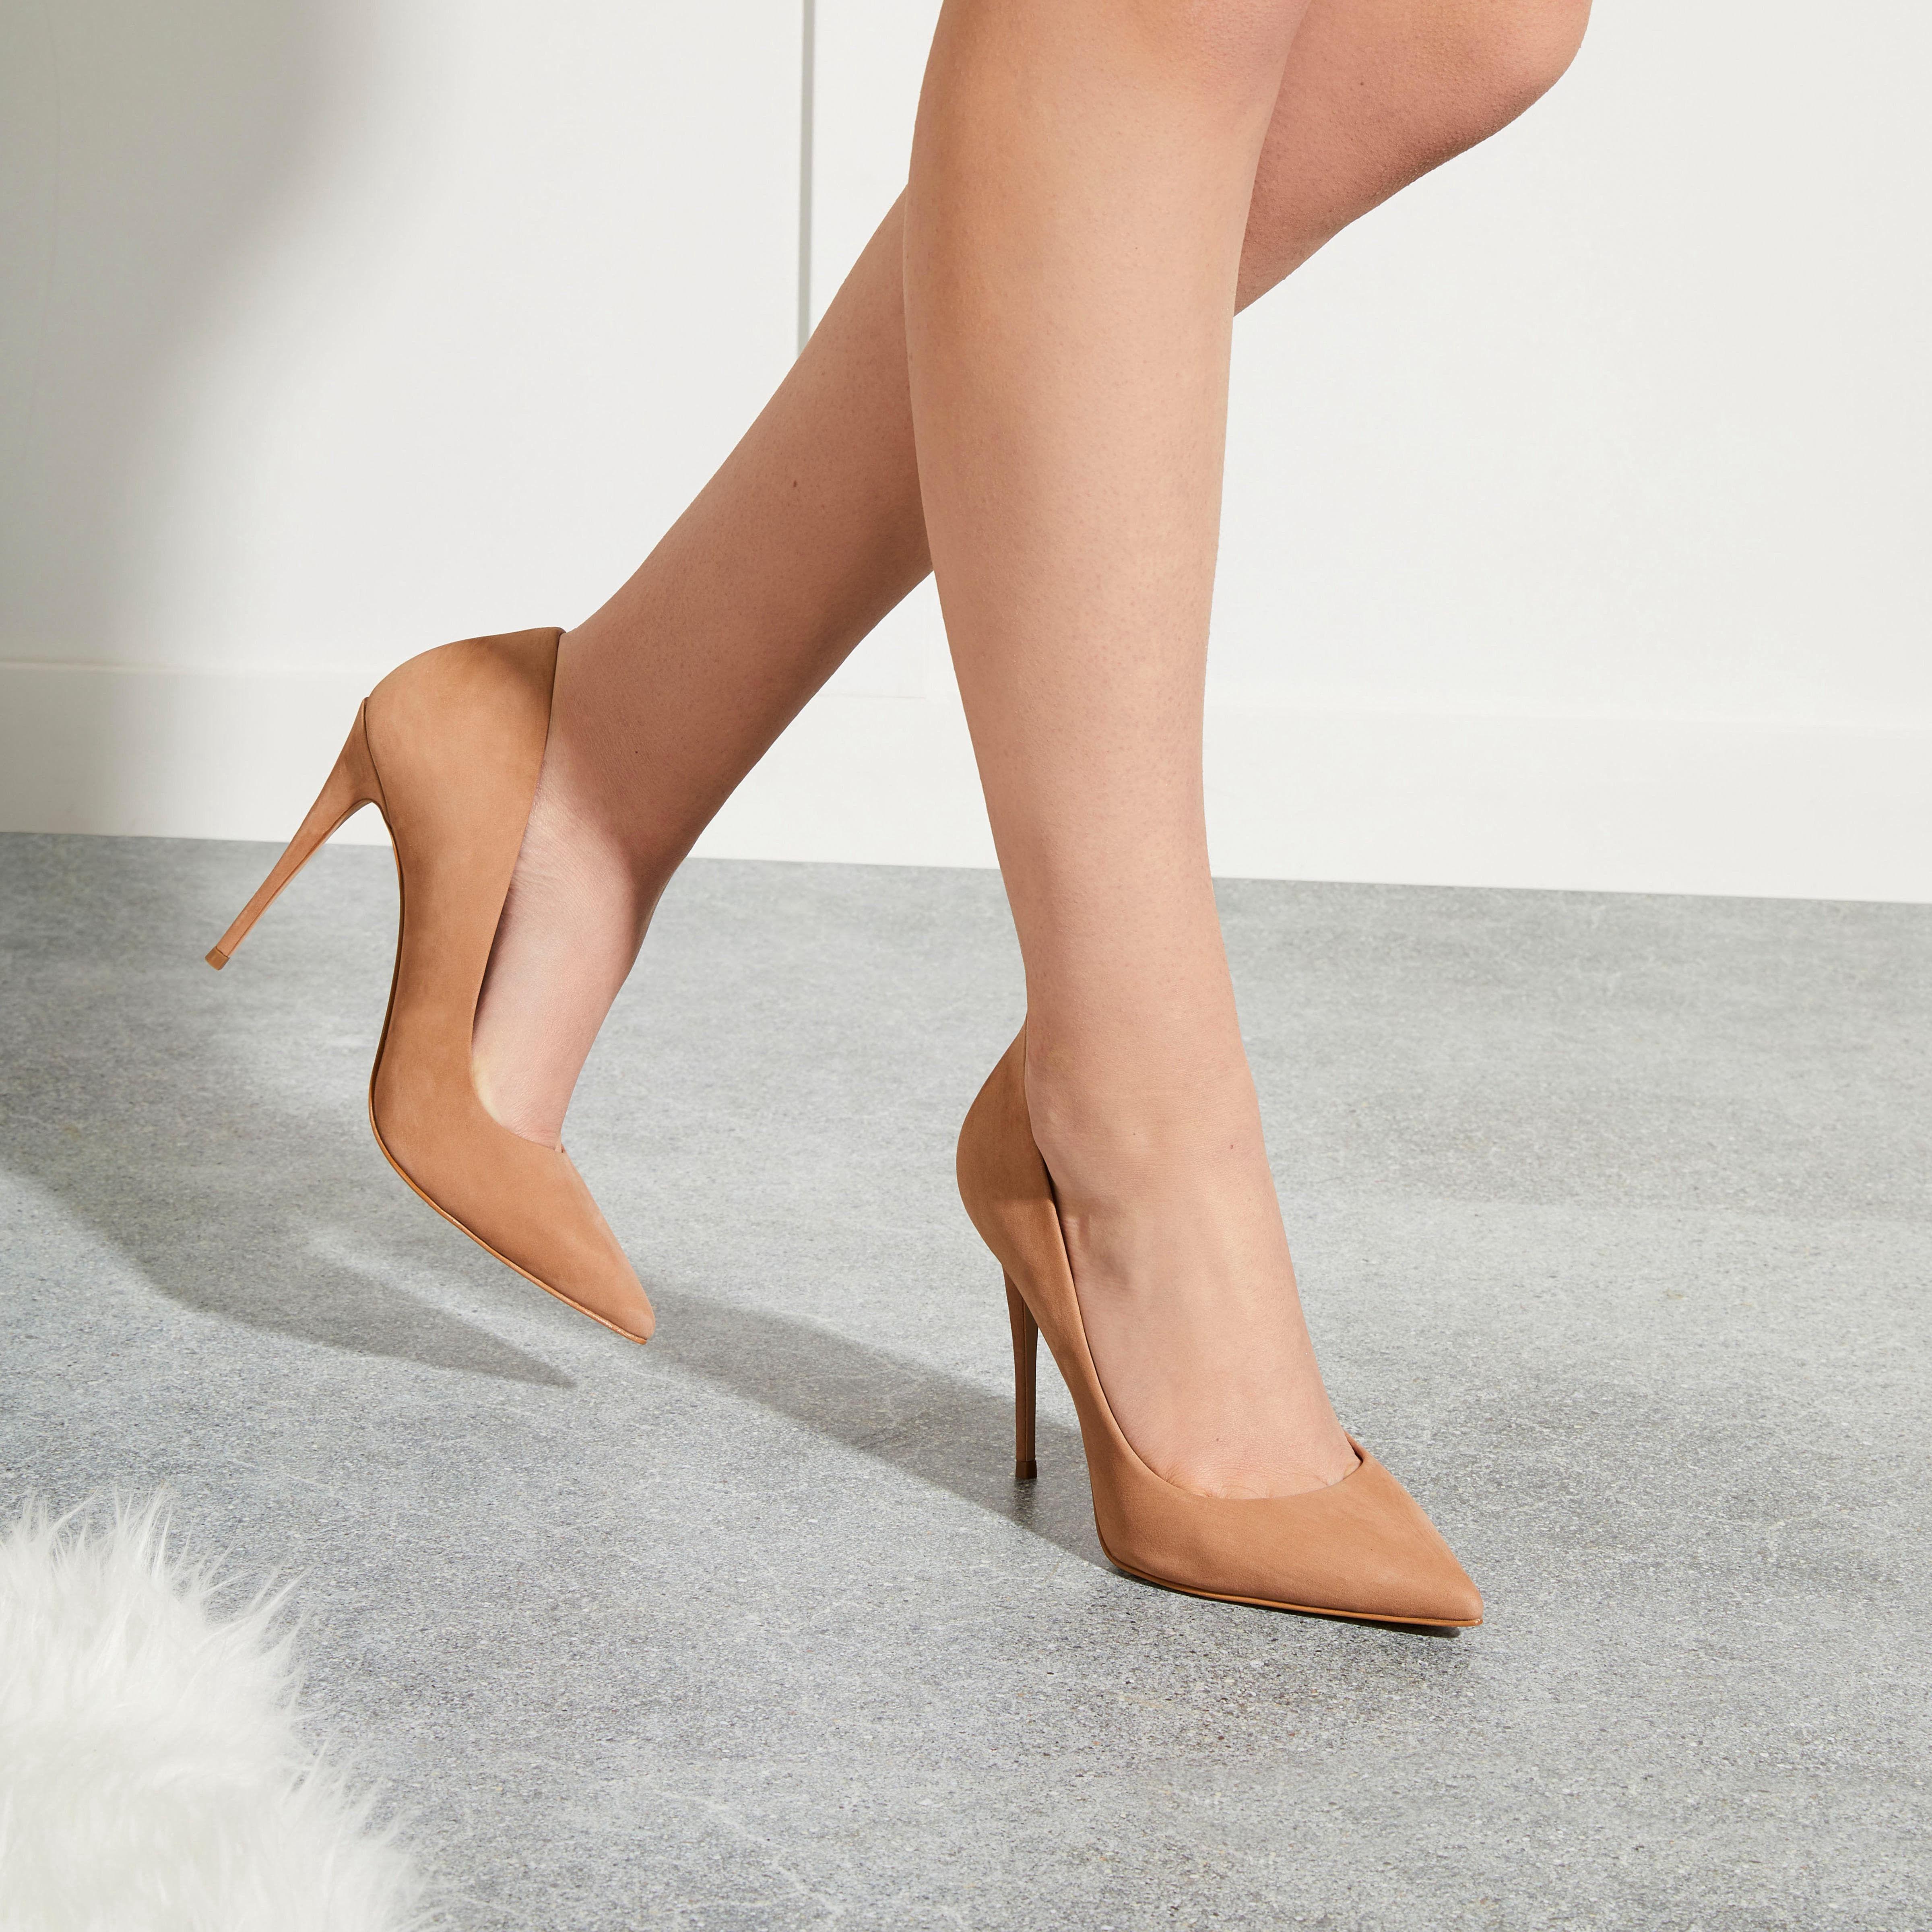 Aldo Hot Pink High Heels 7.5 | eBay